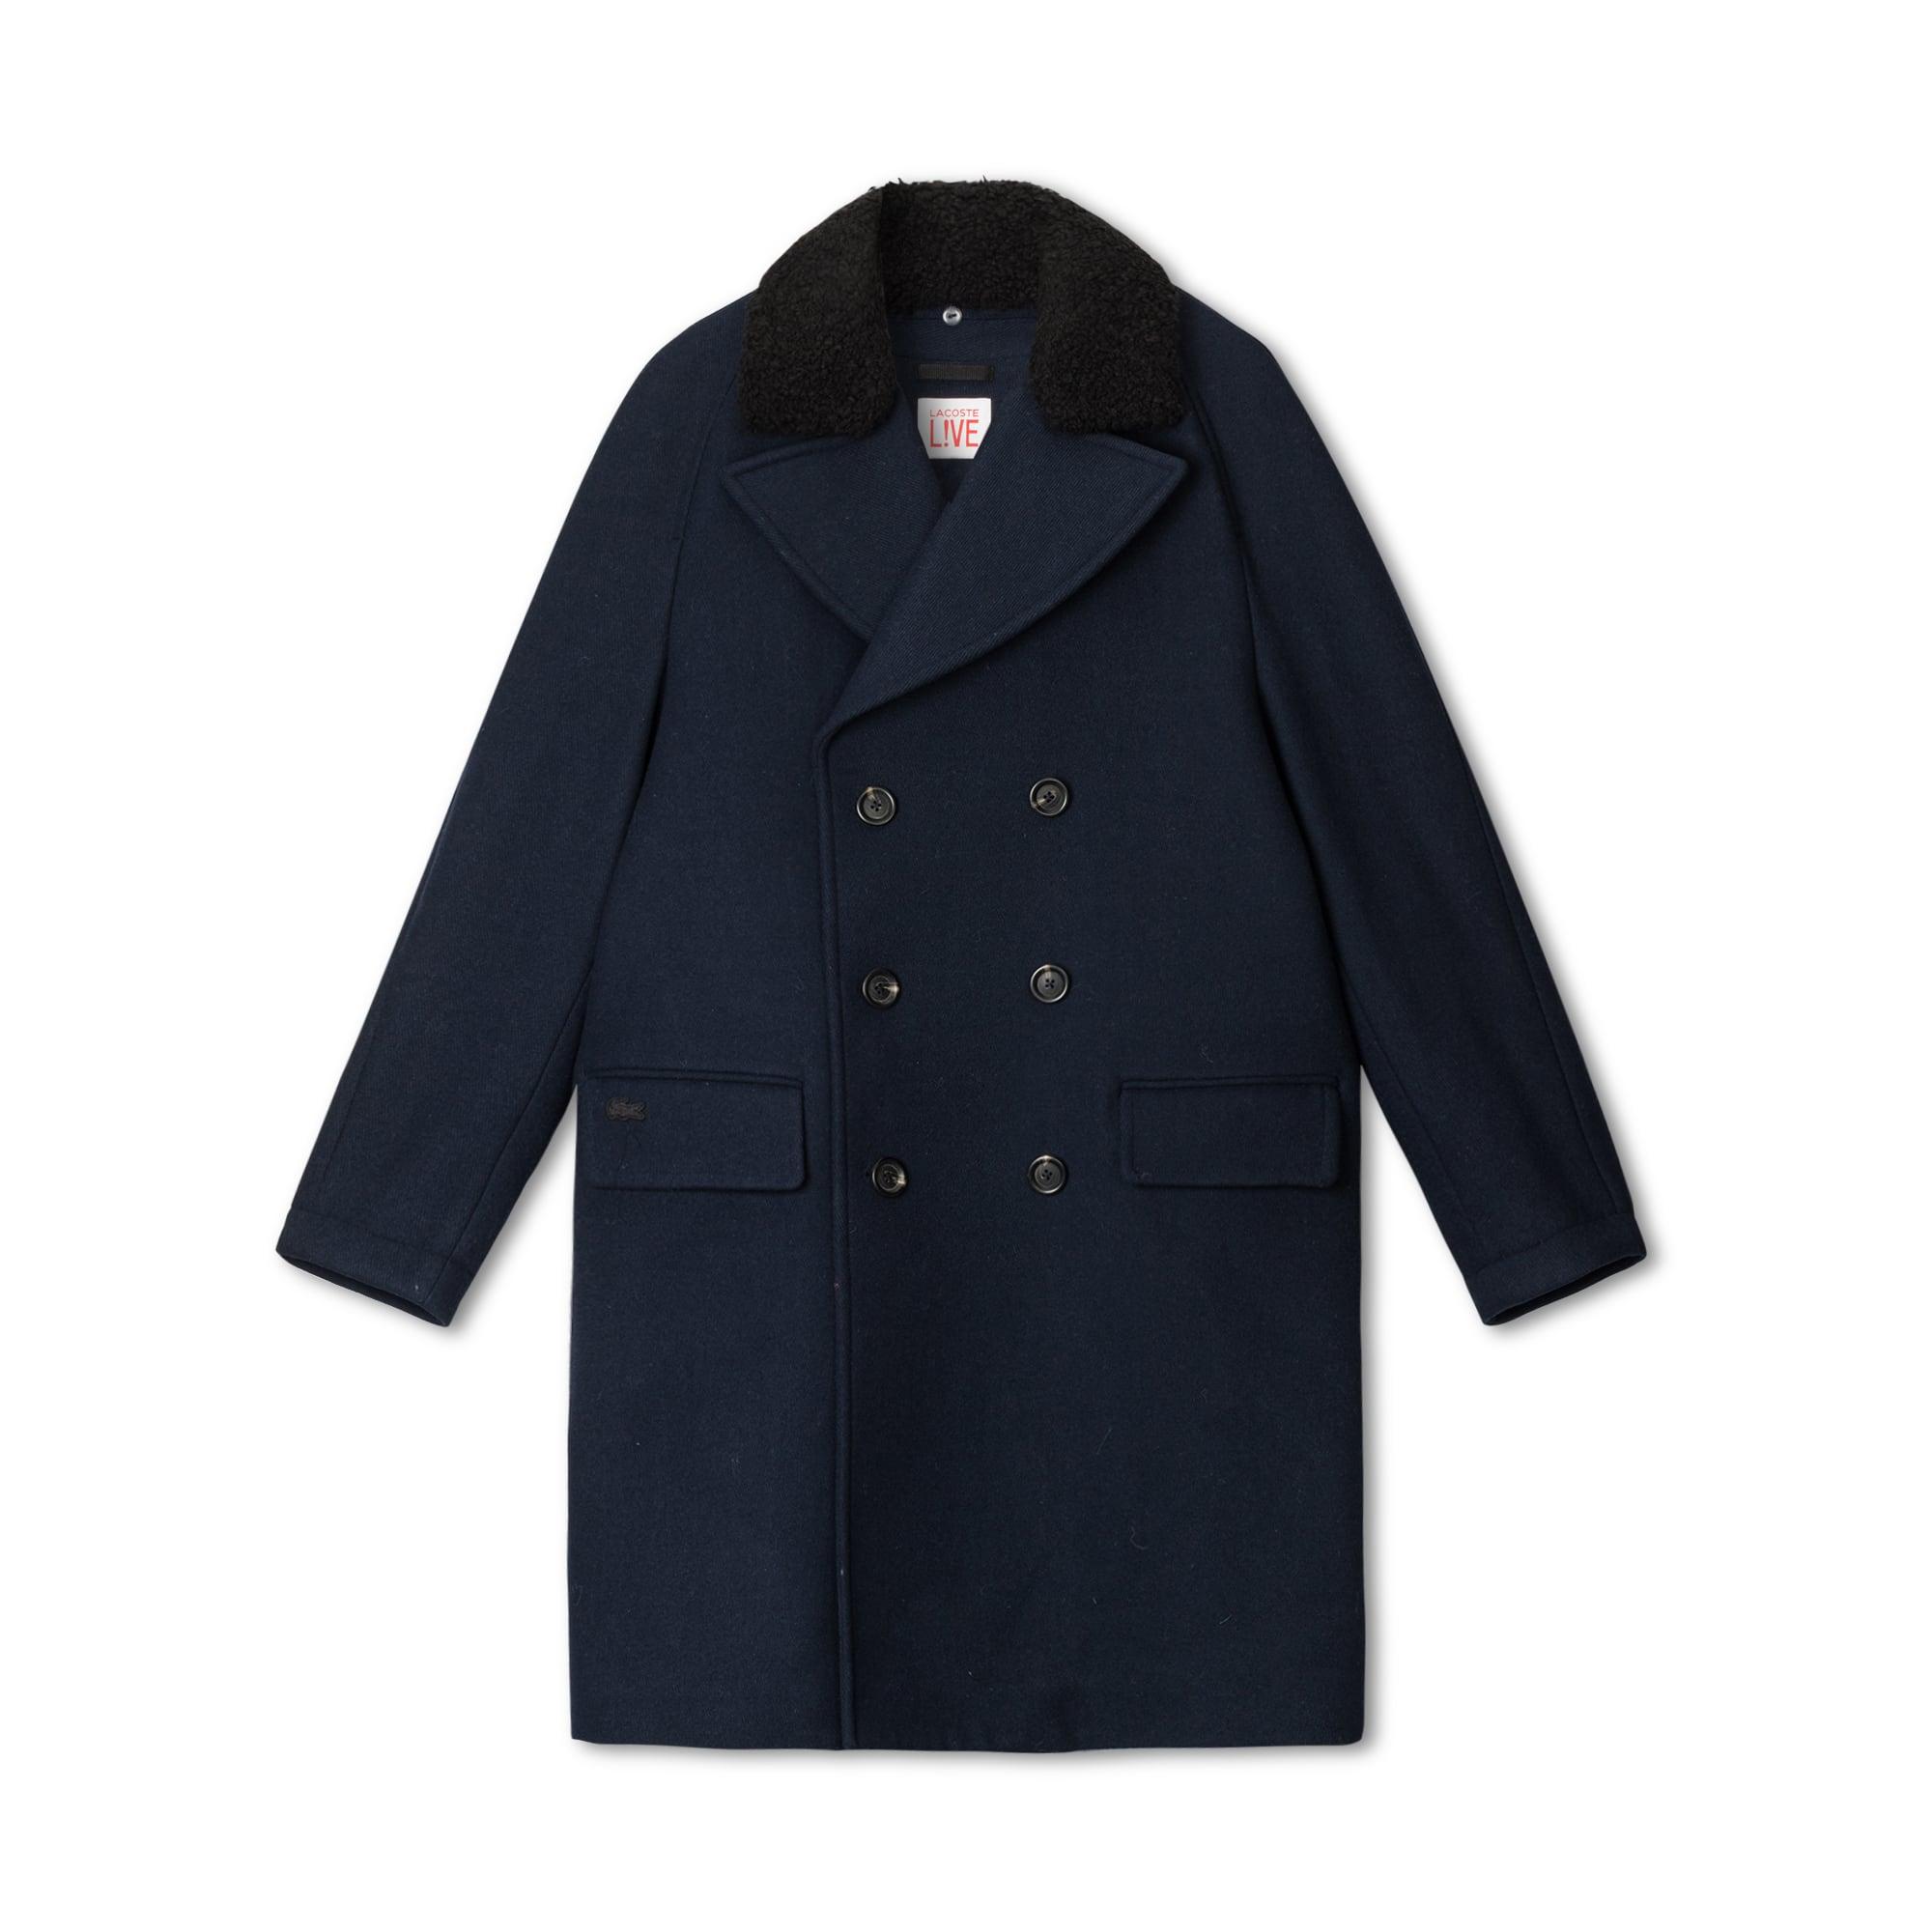 Lacoste LIVE系列全毛绒面呢双排扣水手短外套